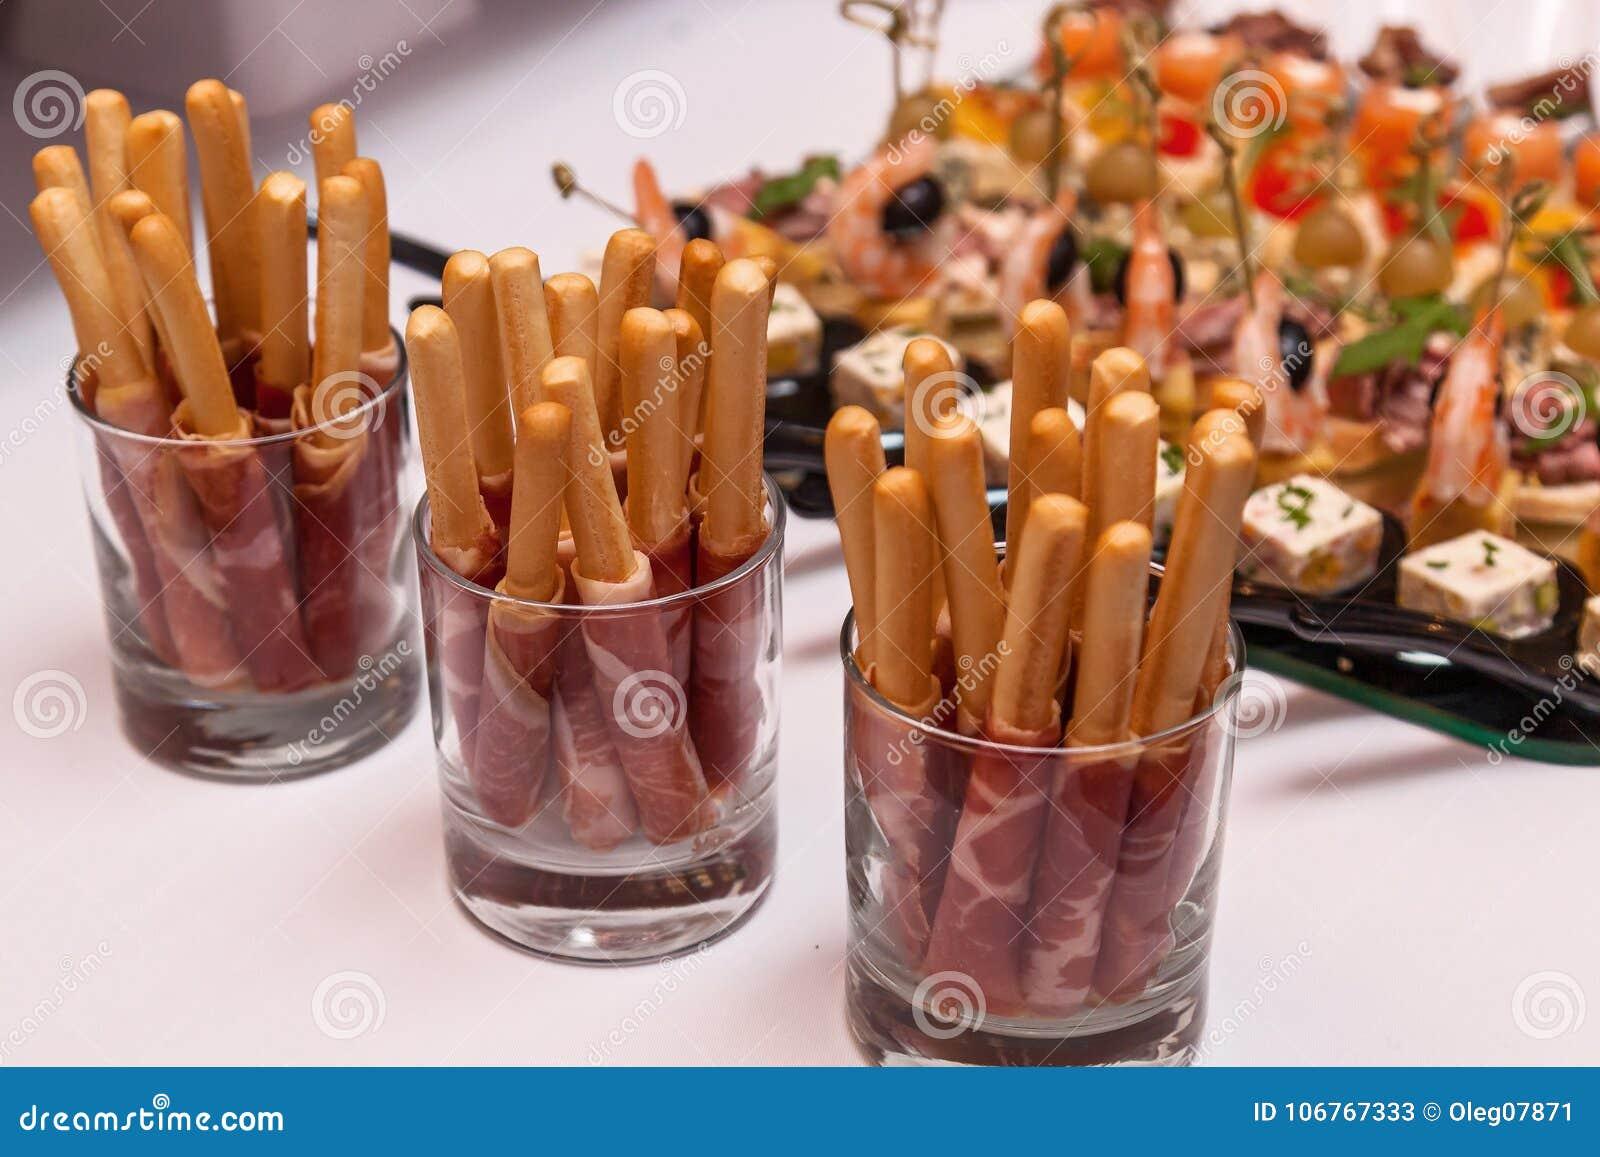 Bread Sticks With A Prosciutto In A Glass Stock Image ...